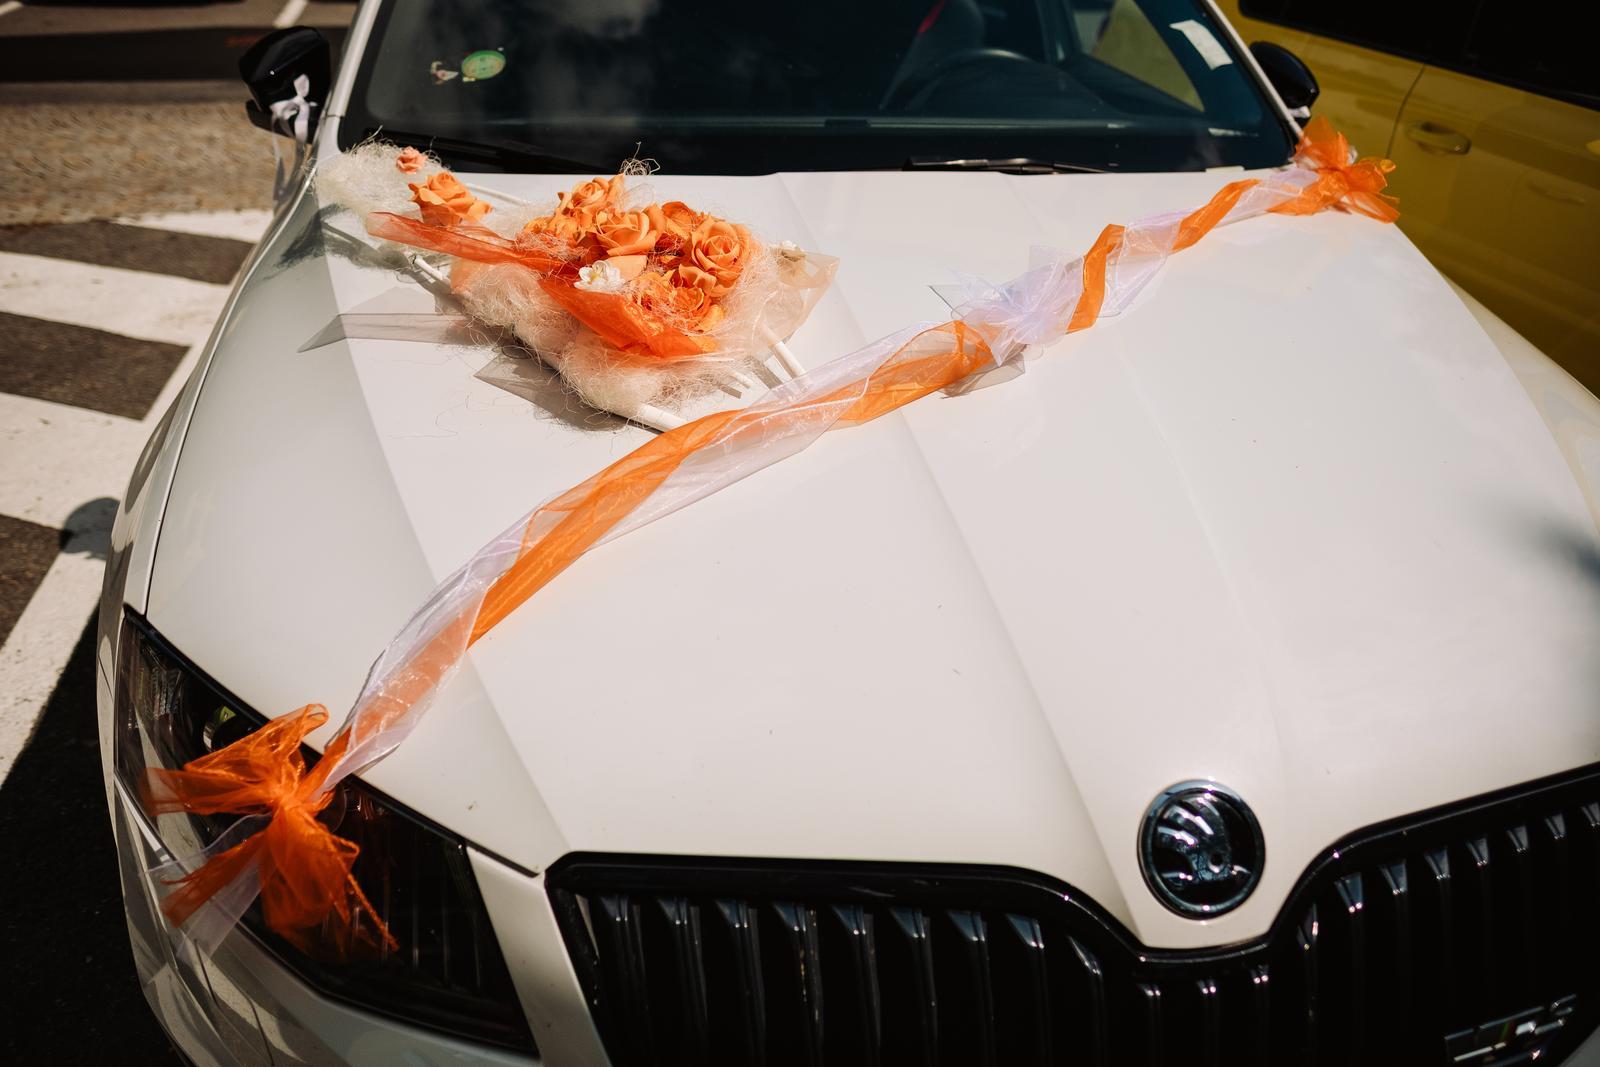 Dekorace Na Auto V Oranzove Barve 150 Kc Svatebni Bazar